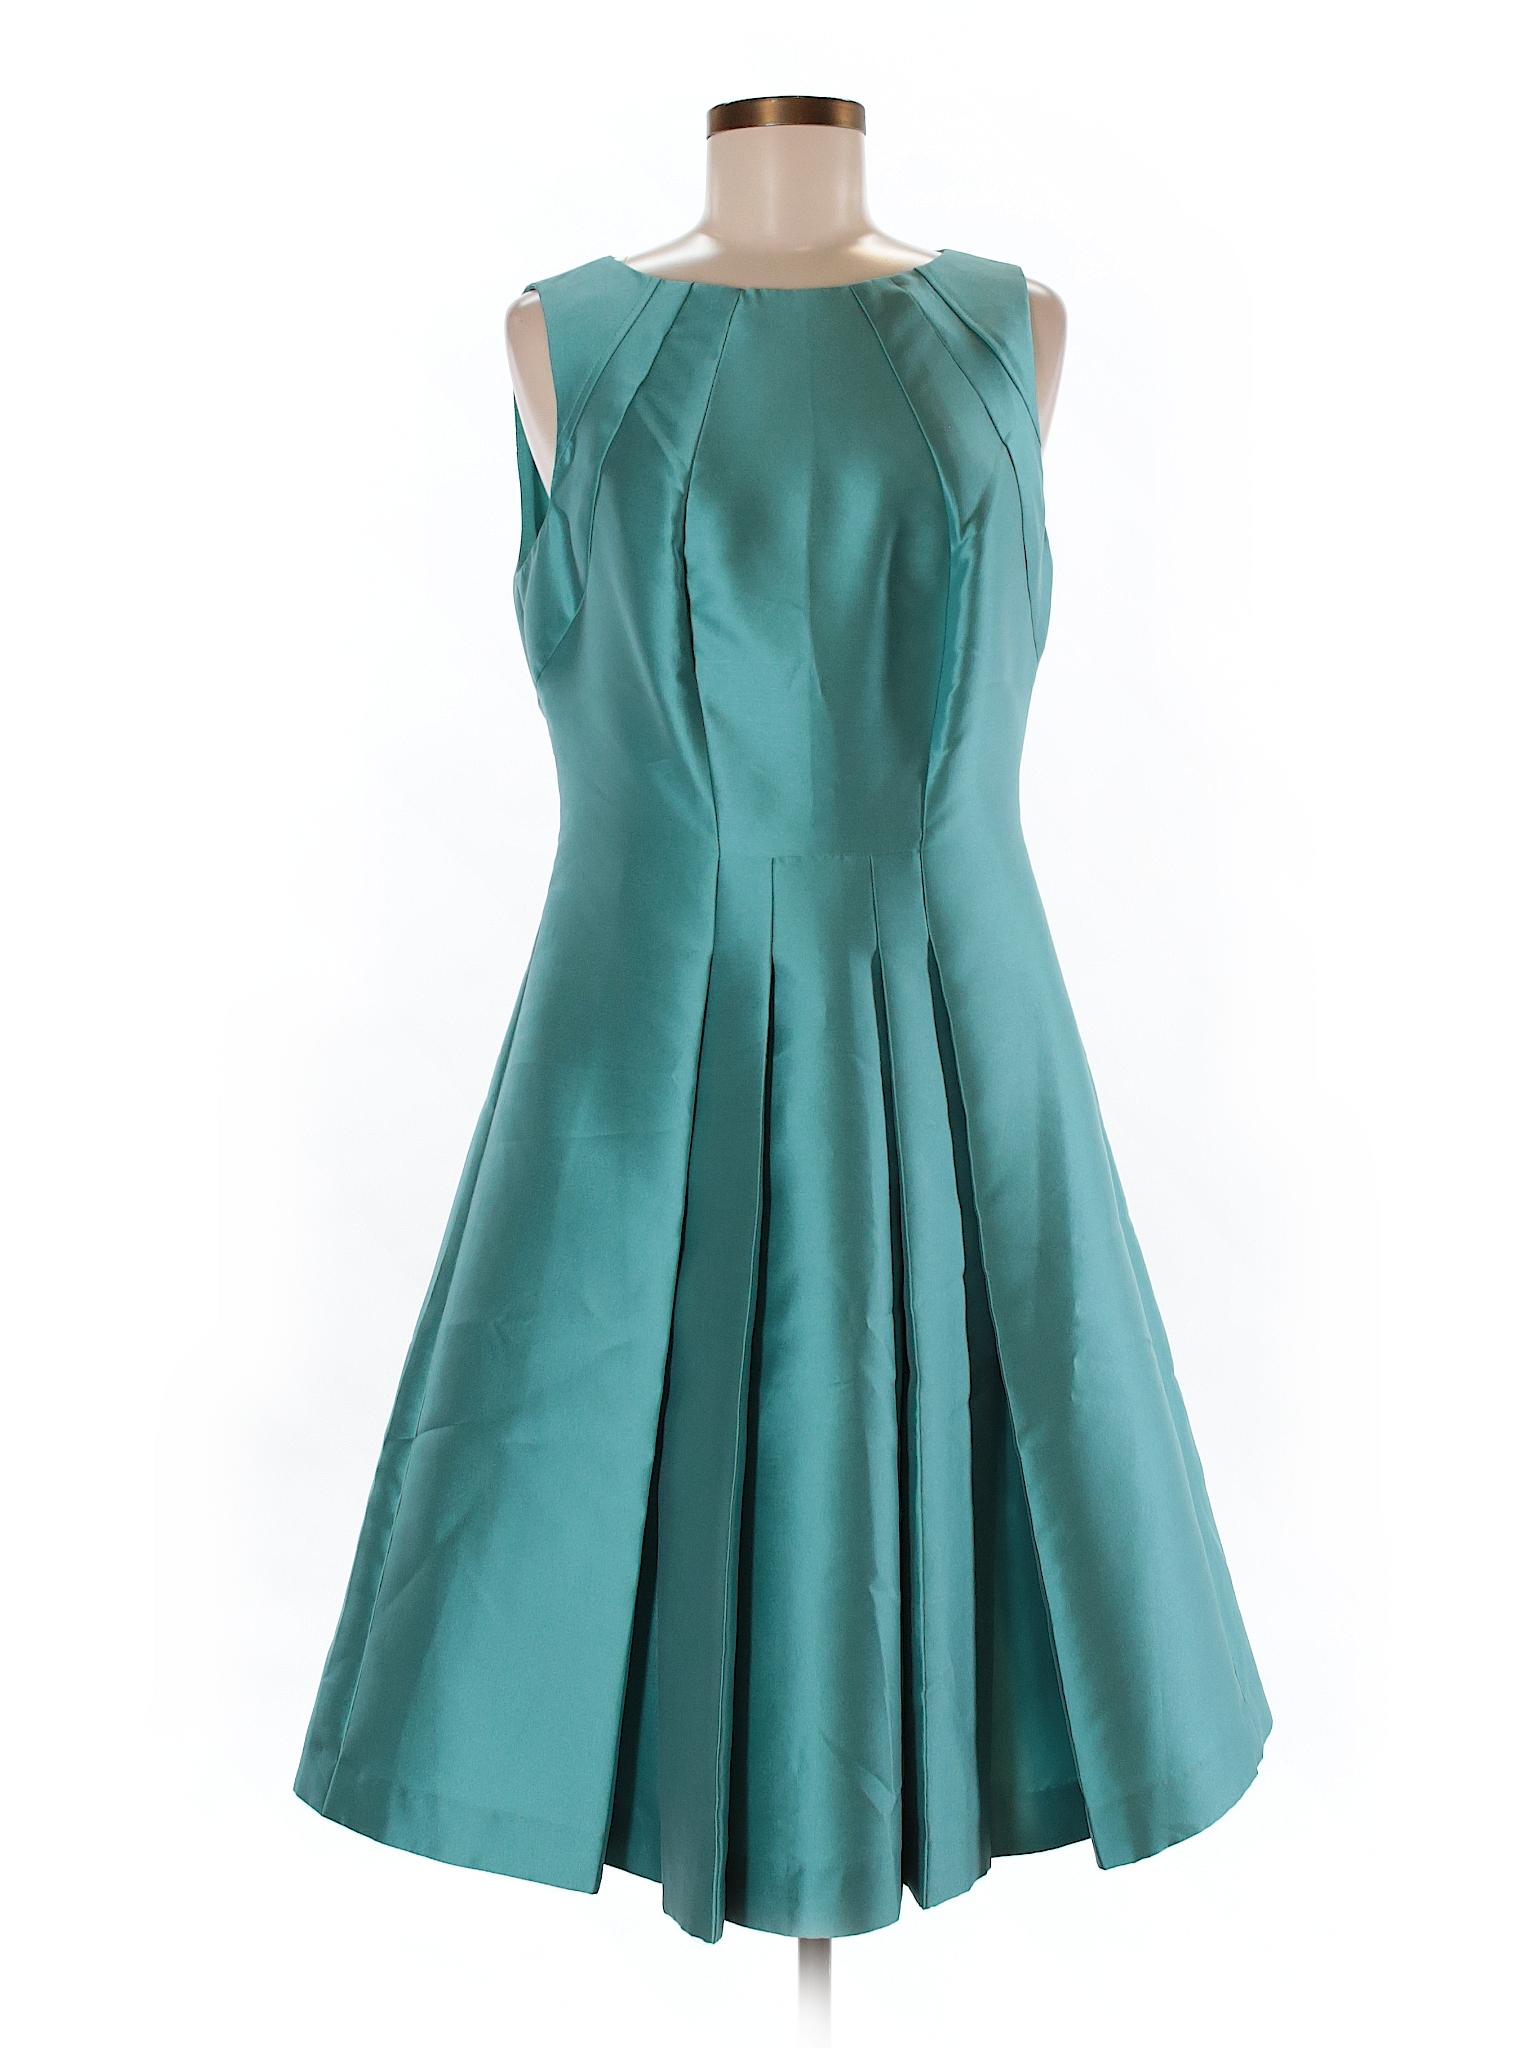 Boutique Dress Casual winter Boutique Carlisle winter HqxOw05